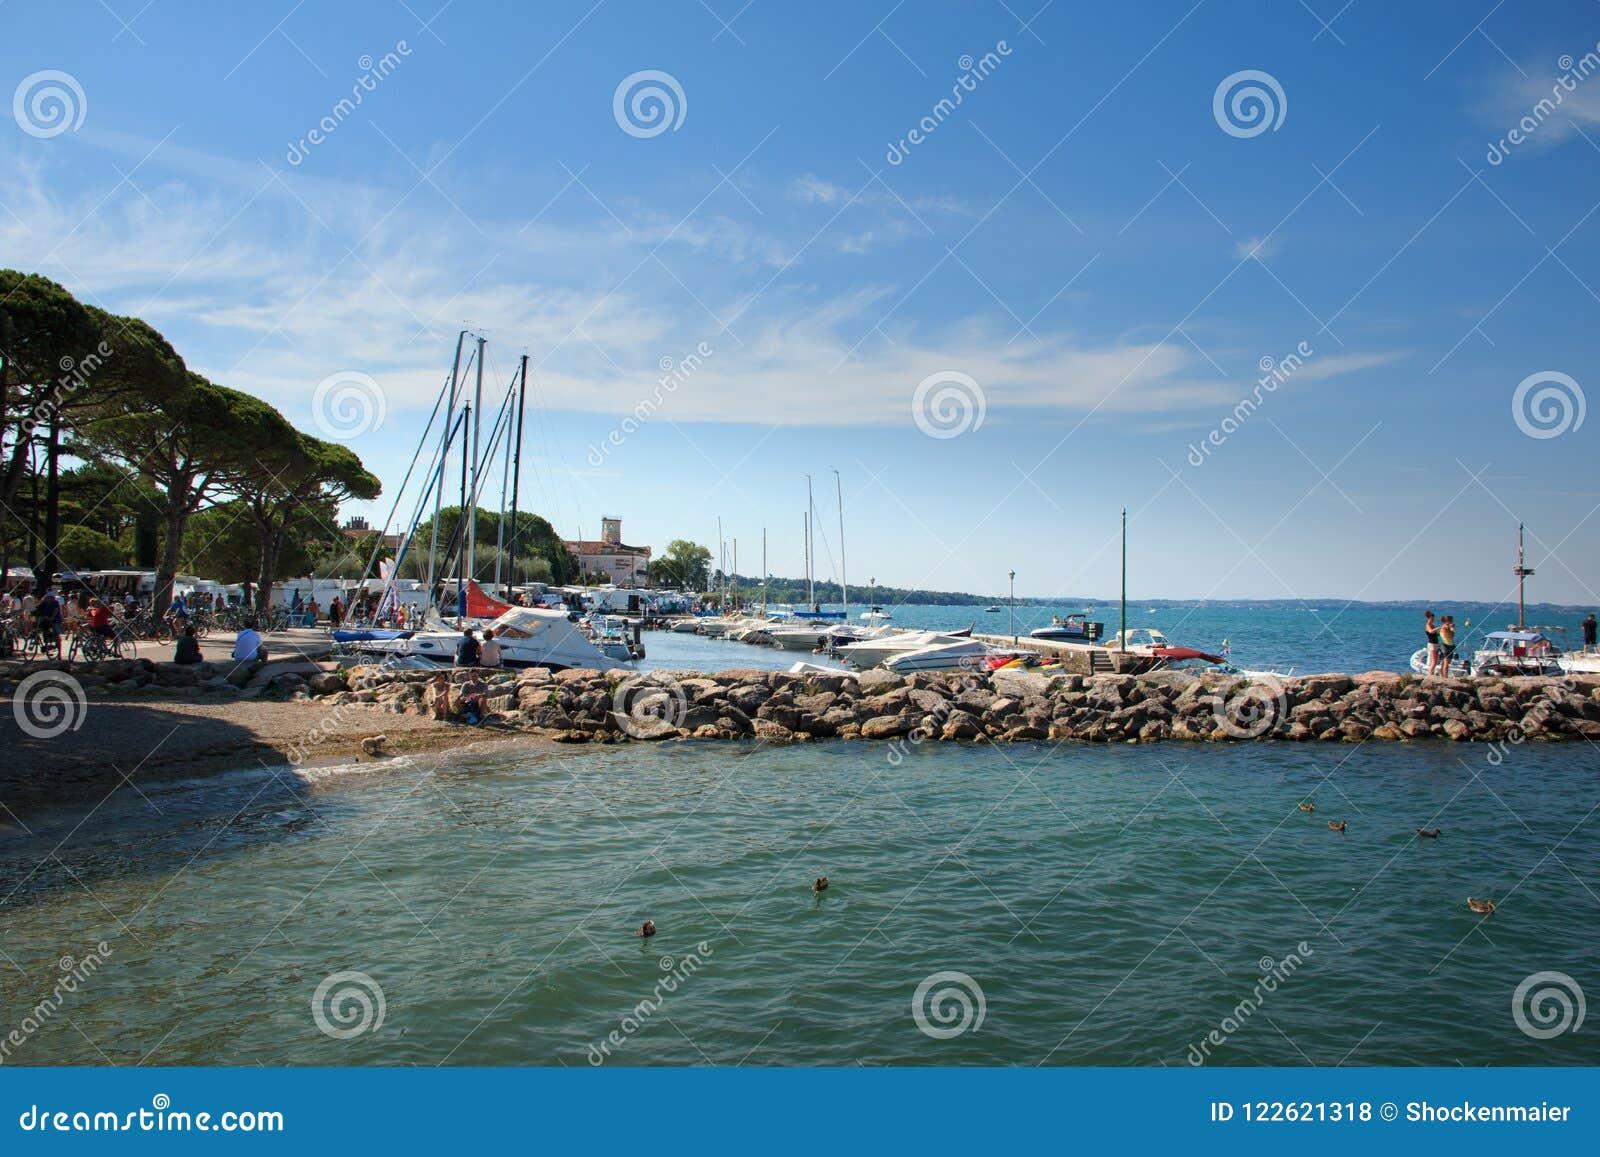 Harbor in Lazise on Lake Garda, Italy